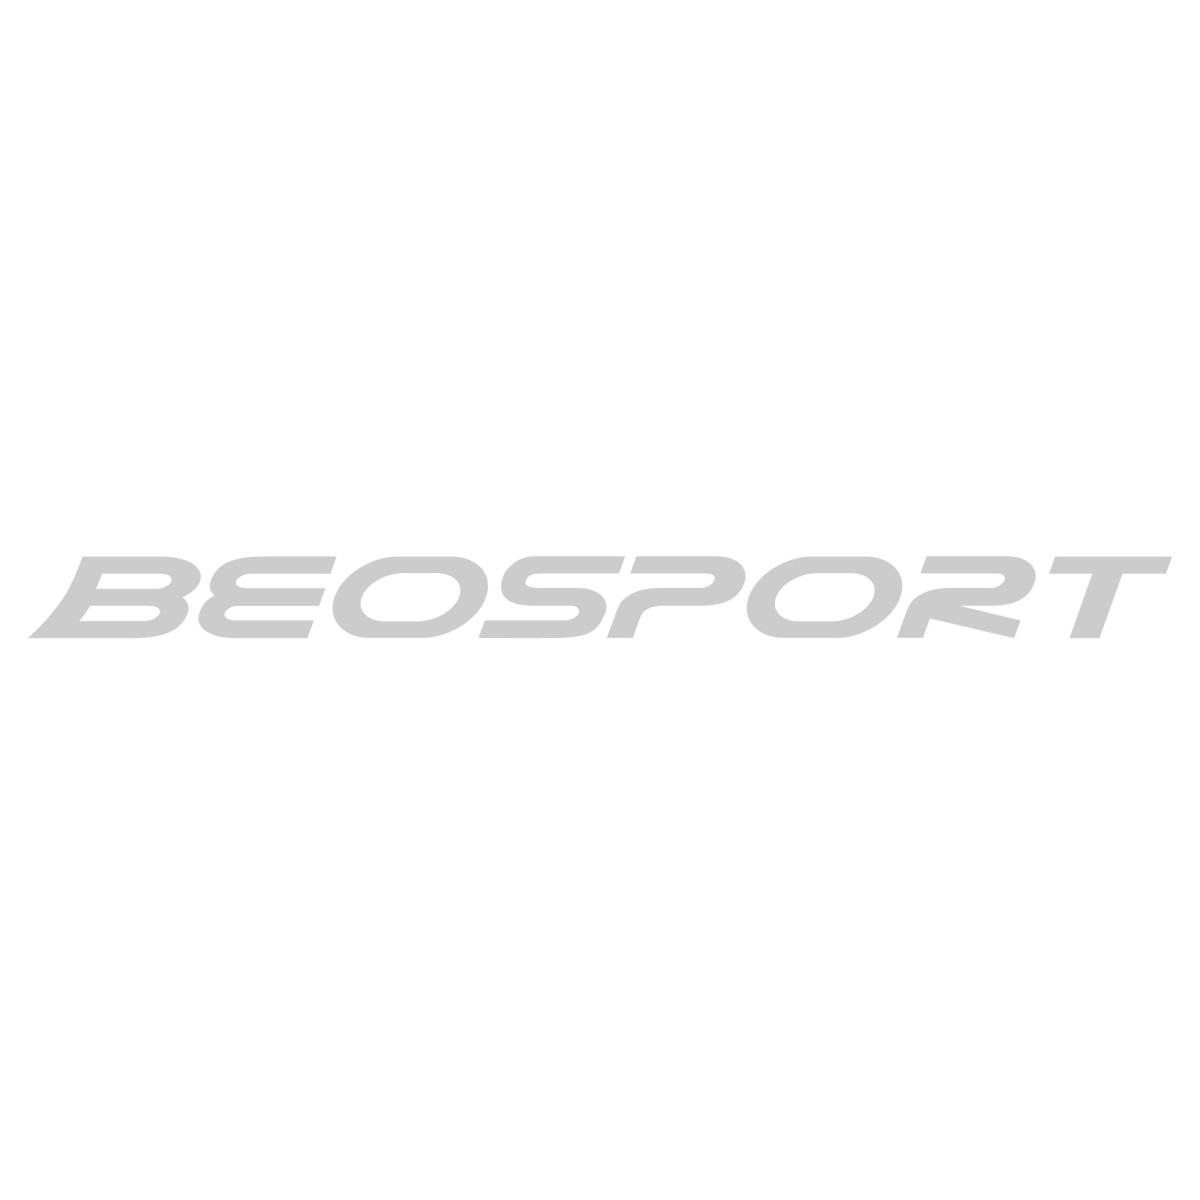 Skechers Metronome - Restless čizme